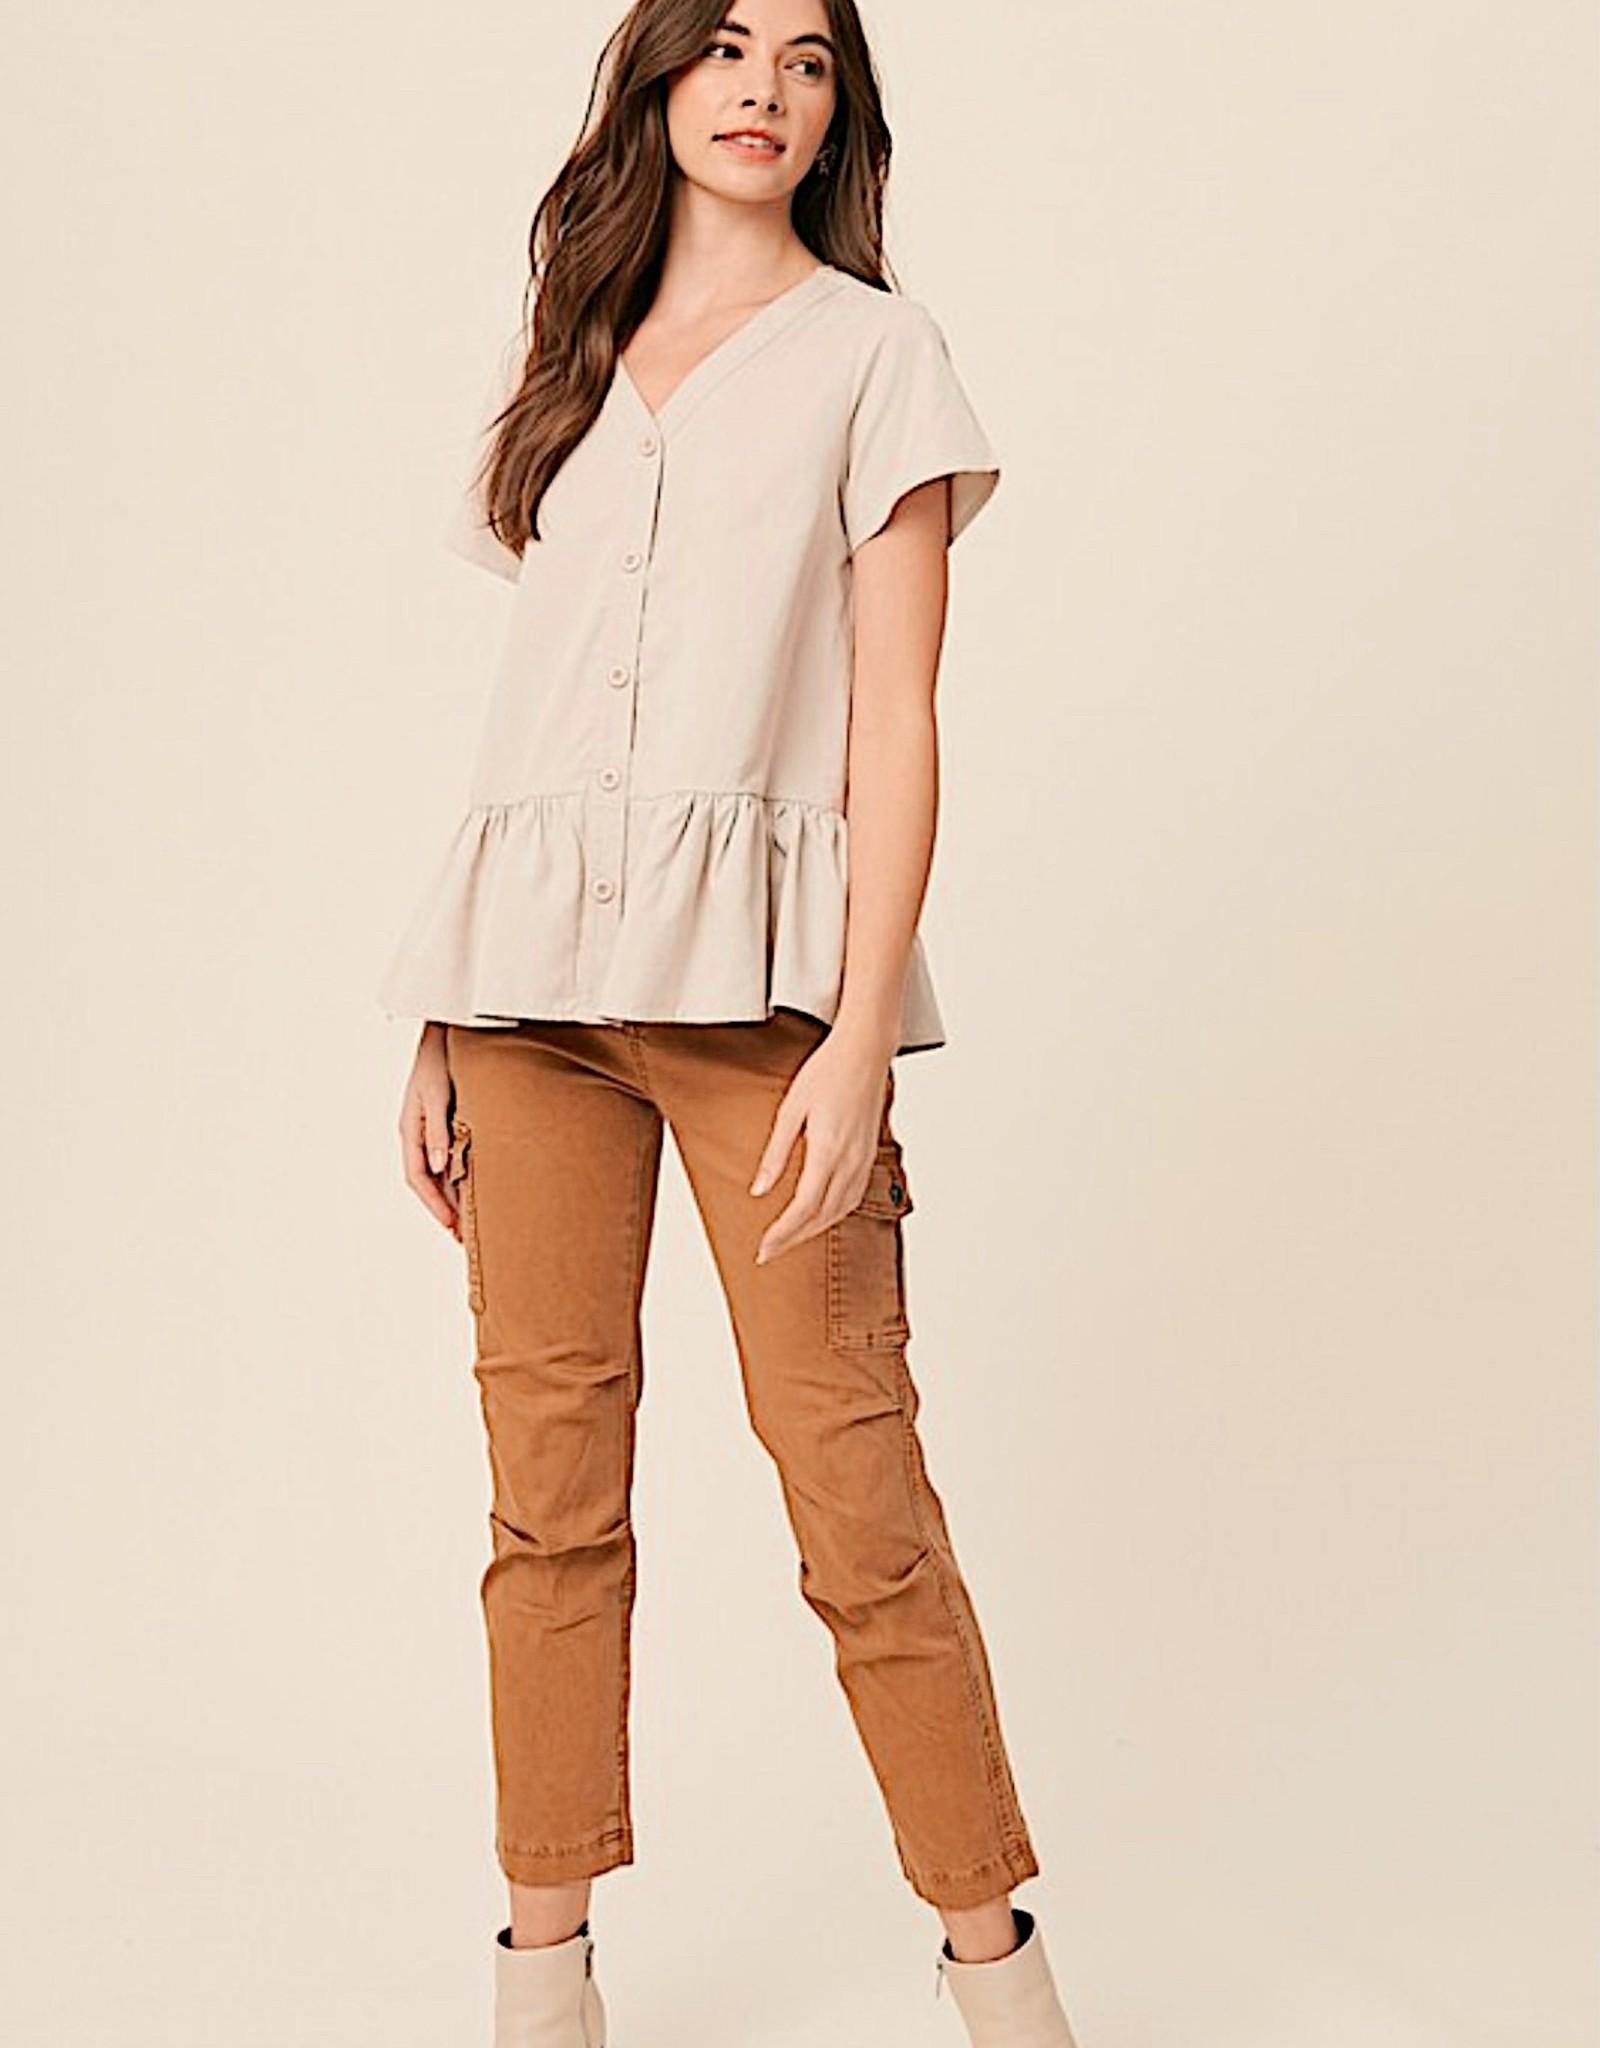 HUSH V neck button down peplum blouse